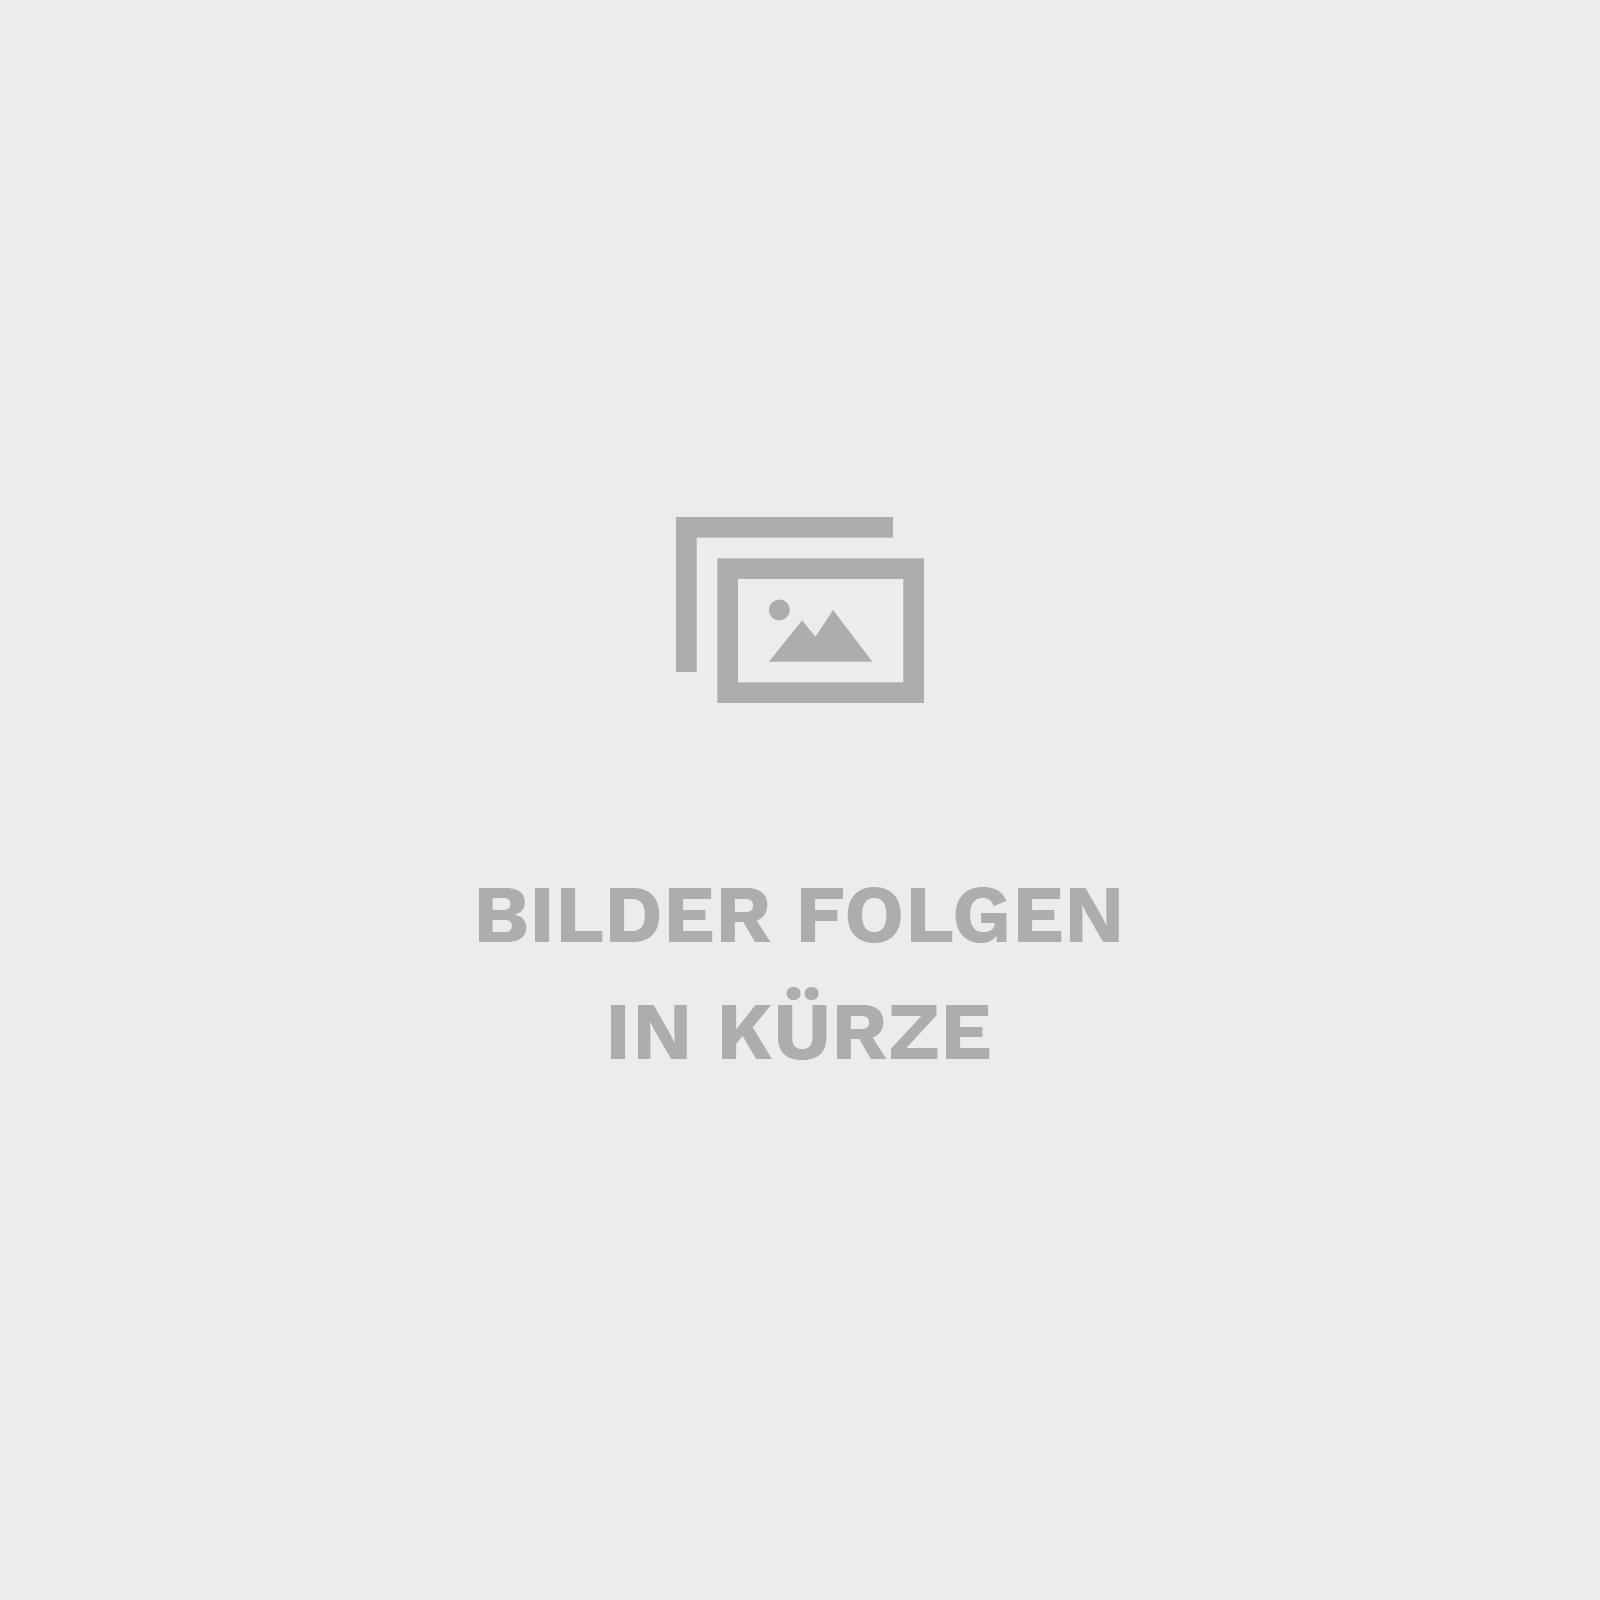 Paper Chandelier - EU Label